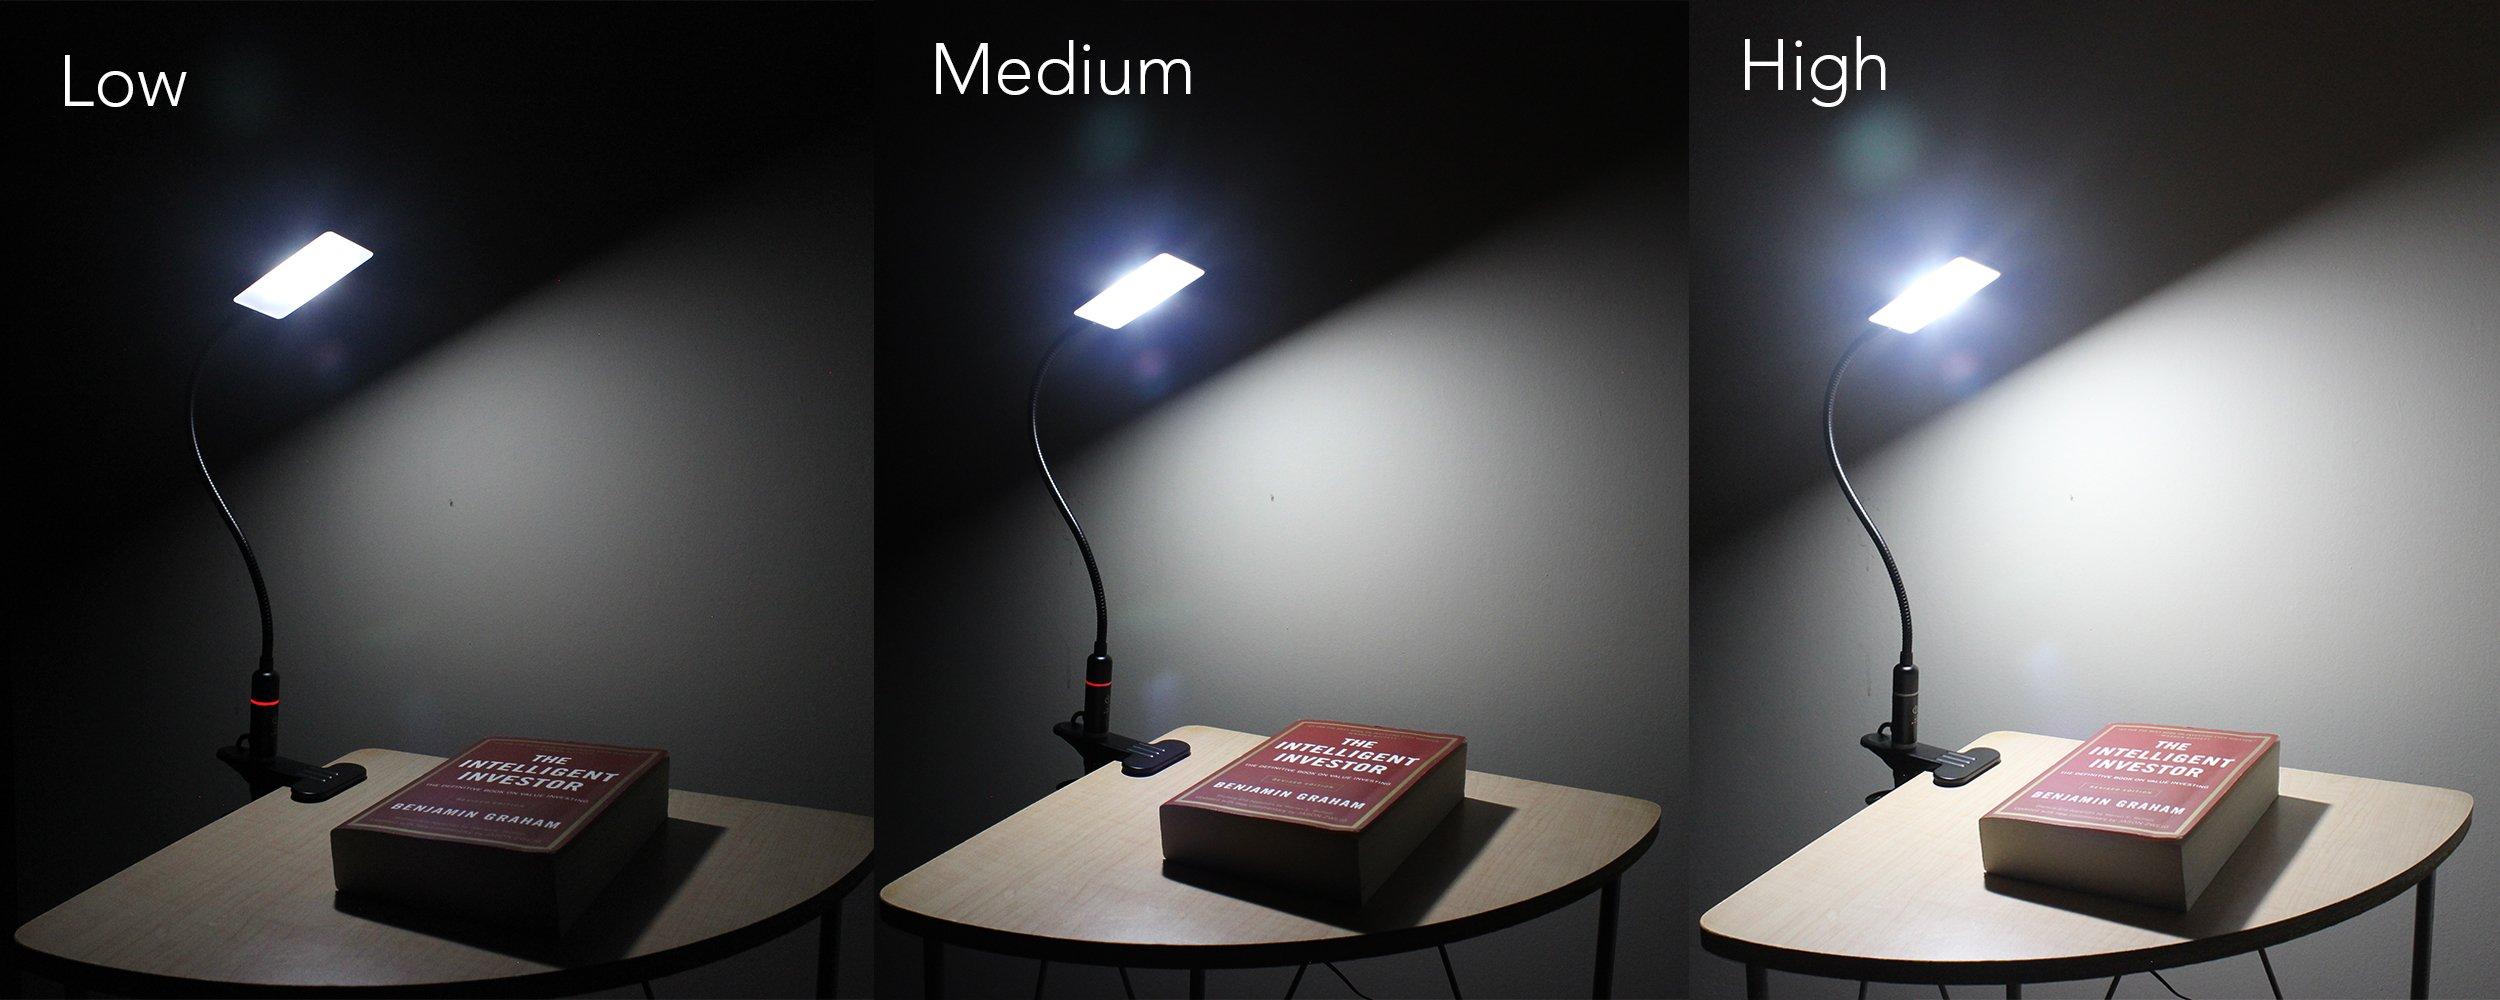 LED Clip Lamp – 3 Brightness Mode – Sensor Touch – USB Plug & Adapter – Black by EazyClips (Image #5)